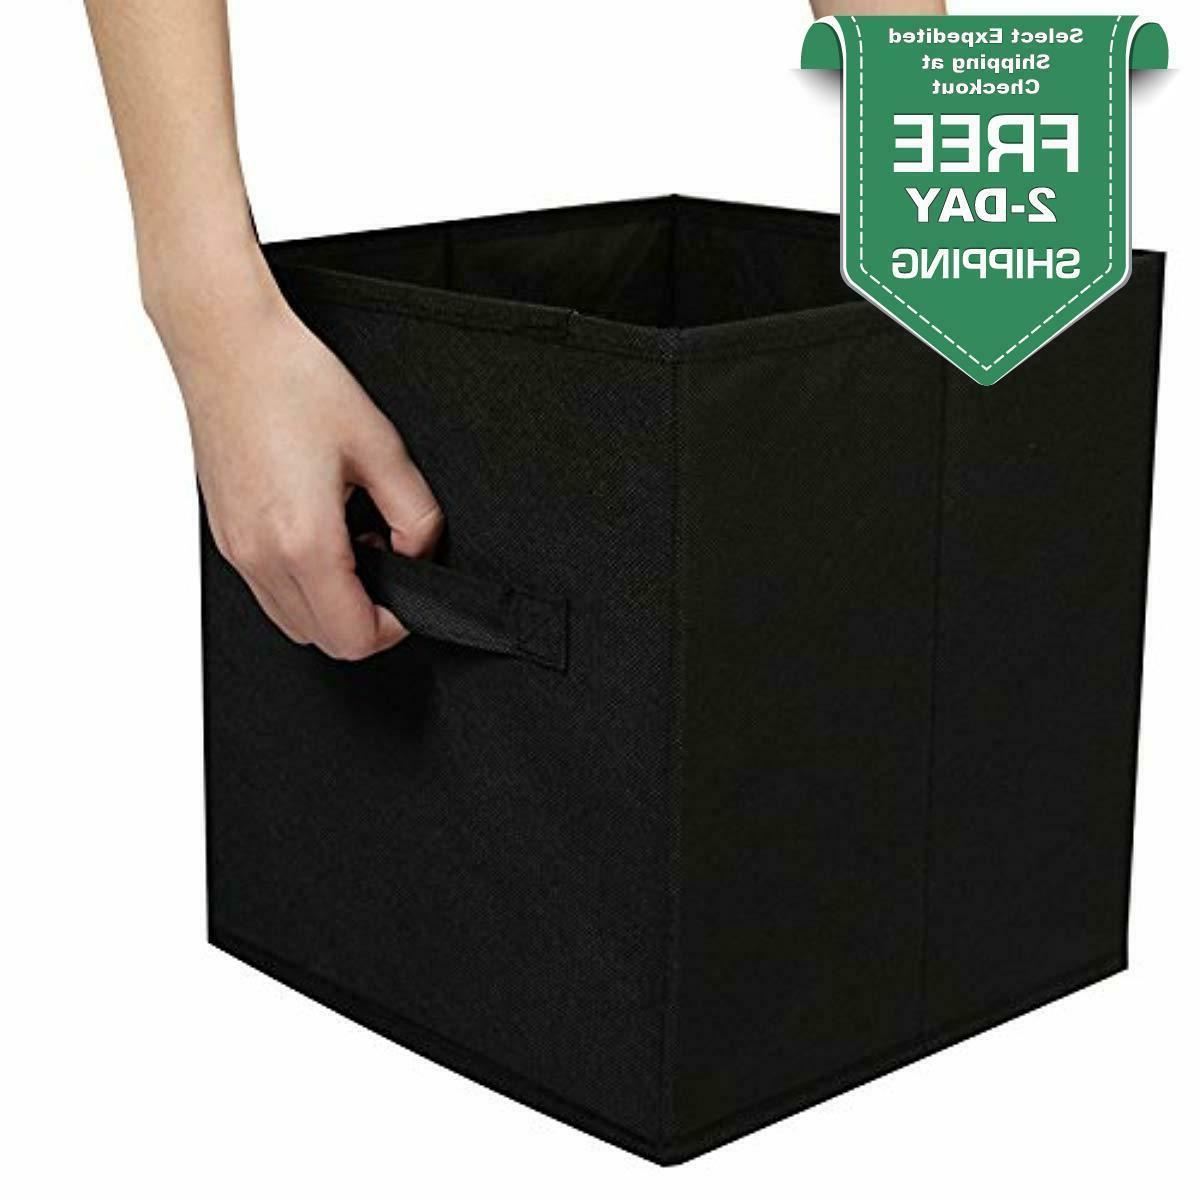 Foldable Storage Basket Box Collapsible Bins